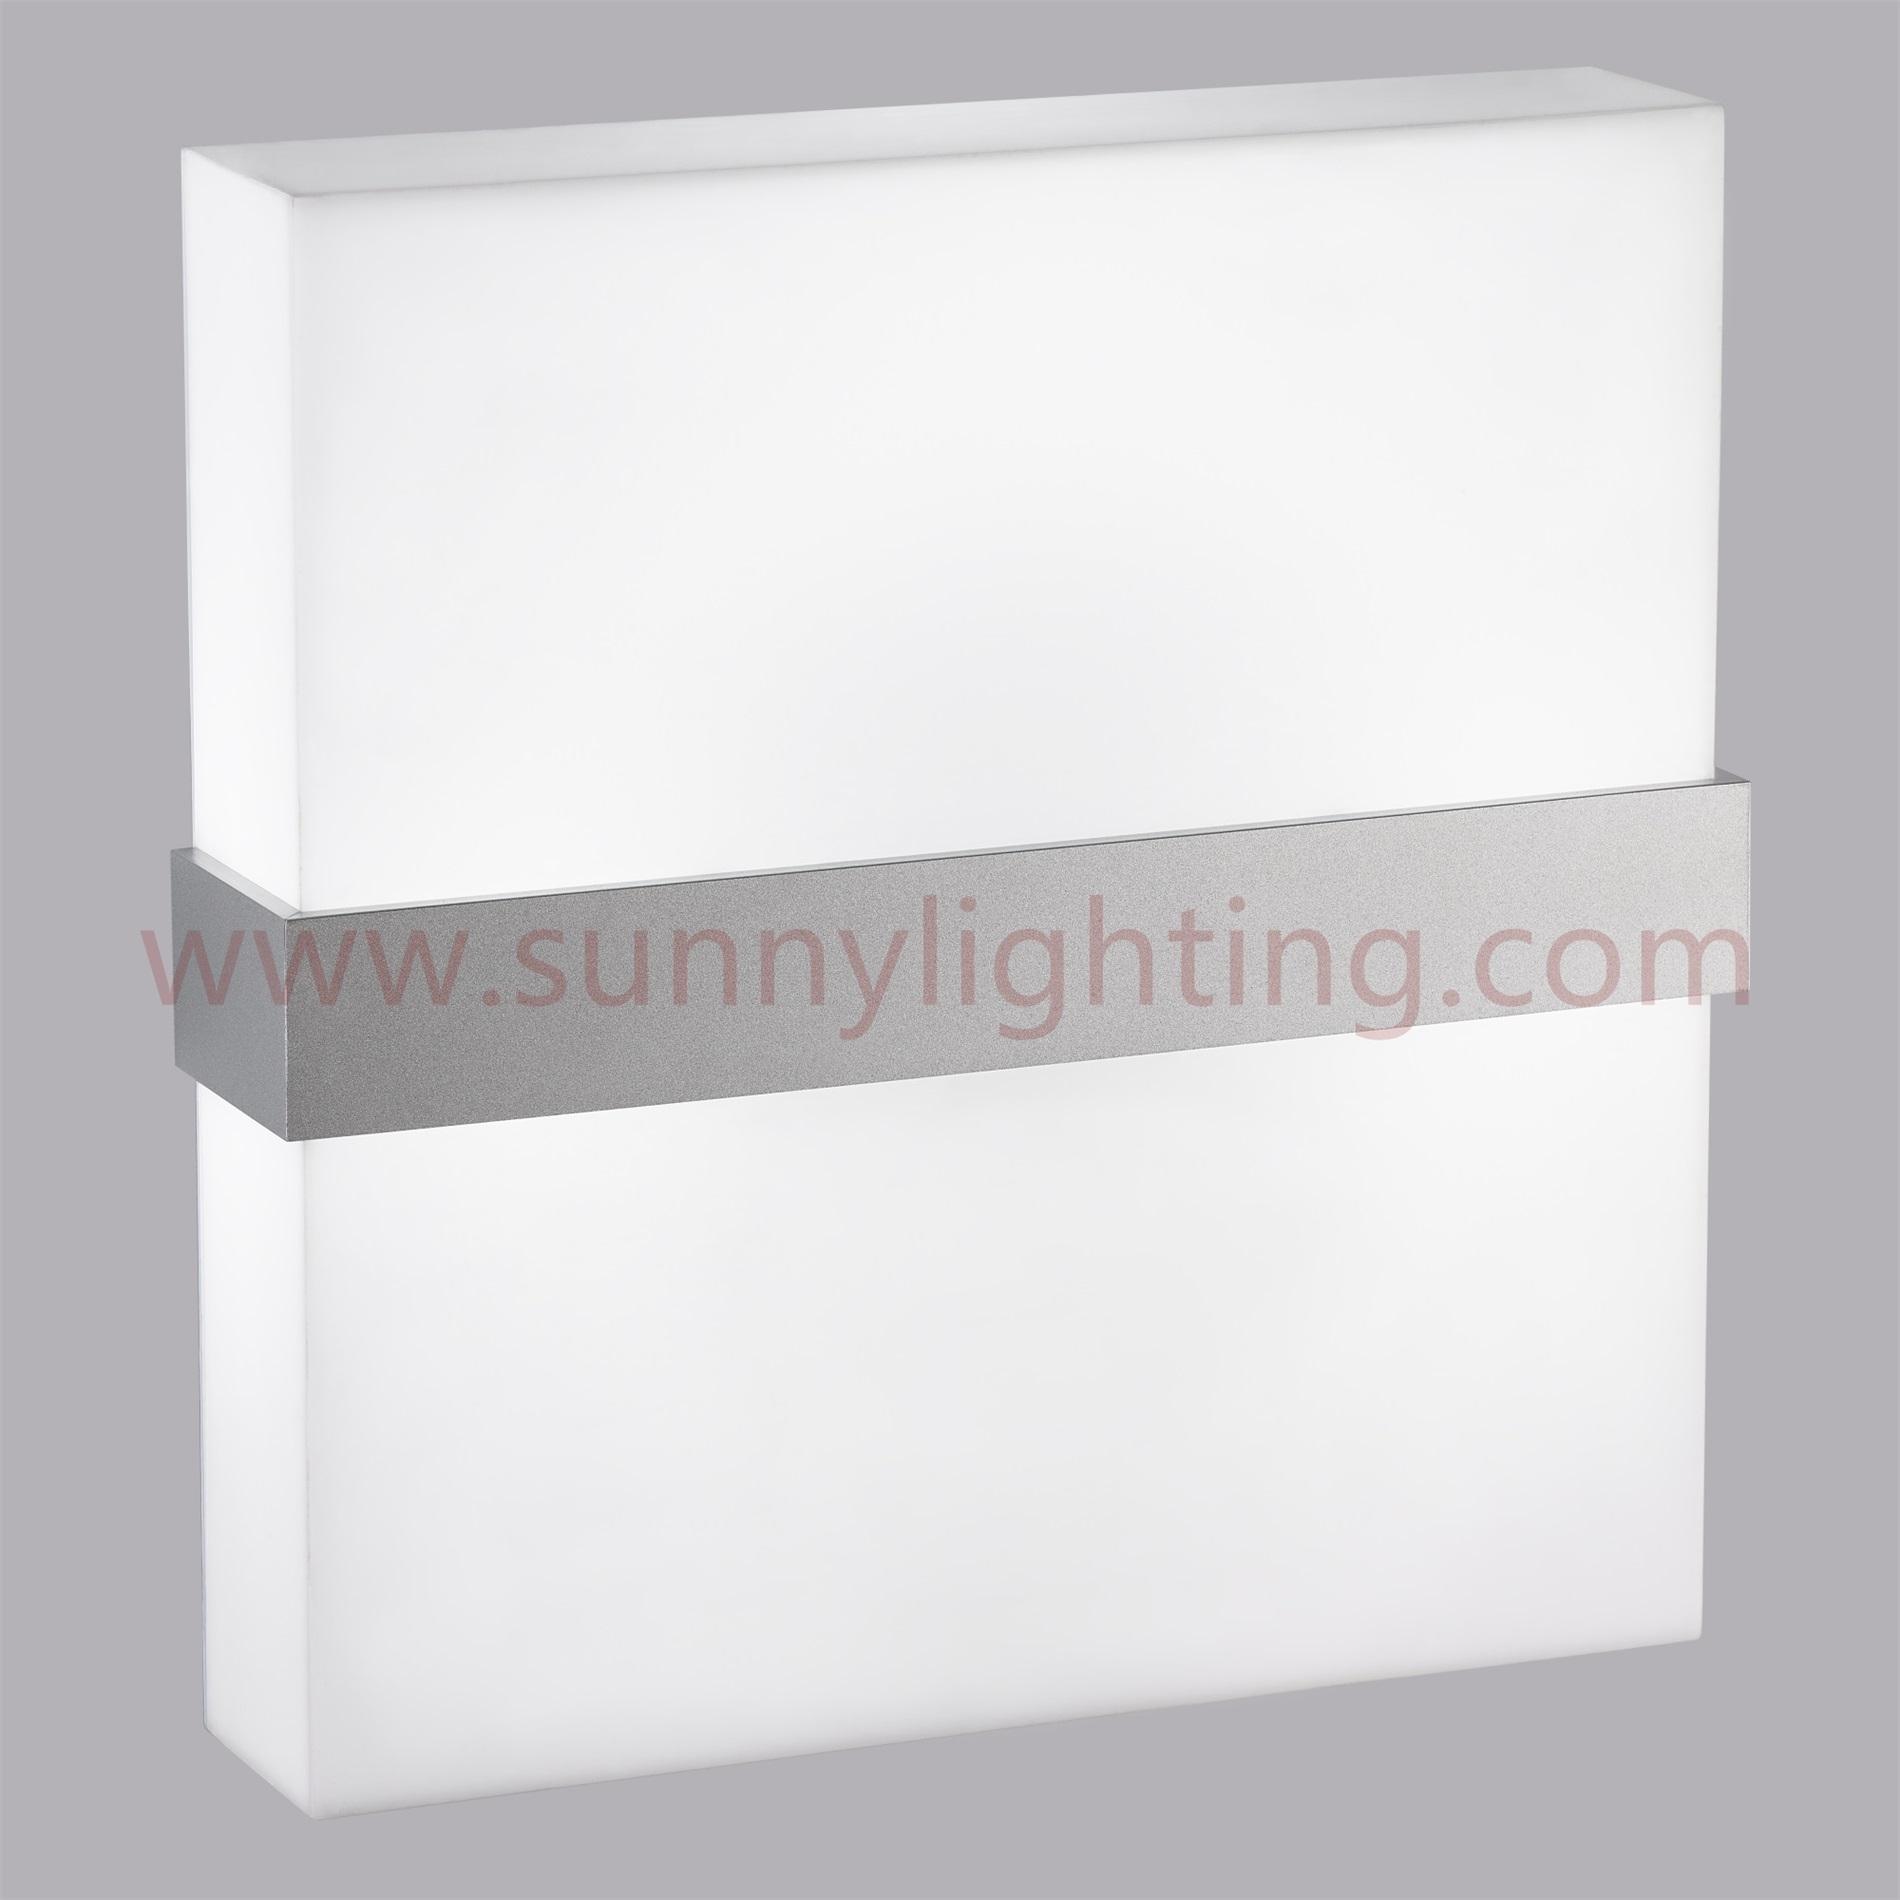 LED Wall Surfuace Mounted Lamp 18W/22W LED-13A